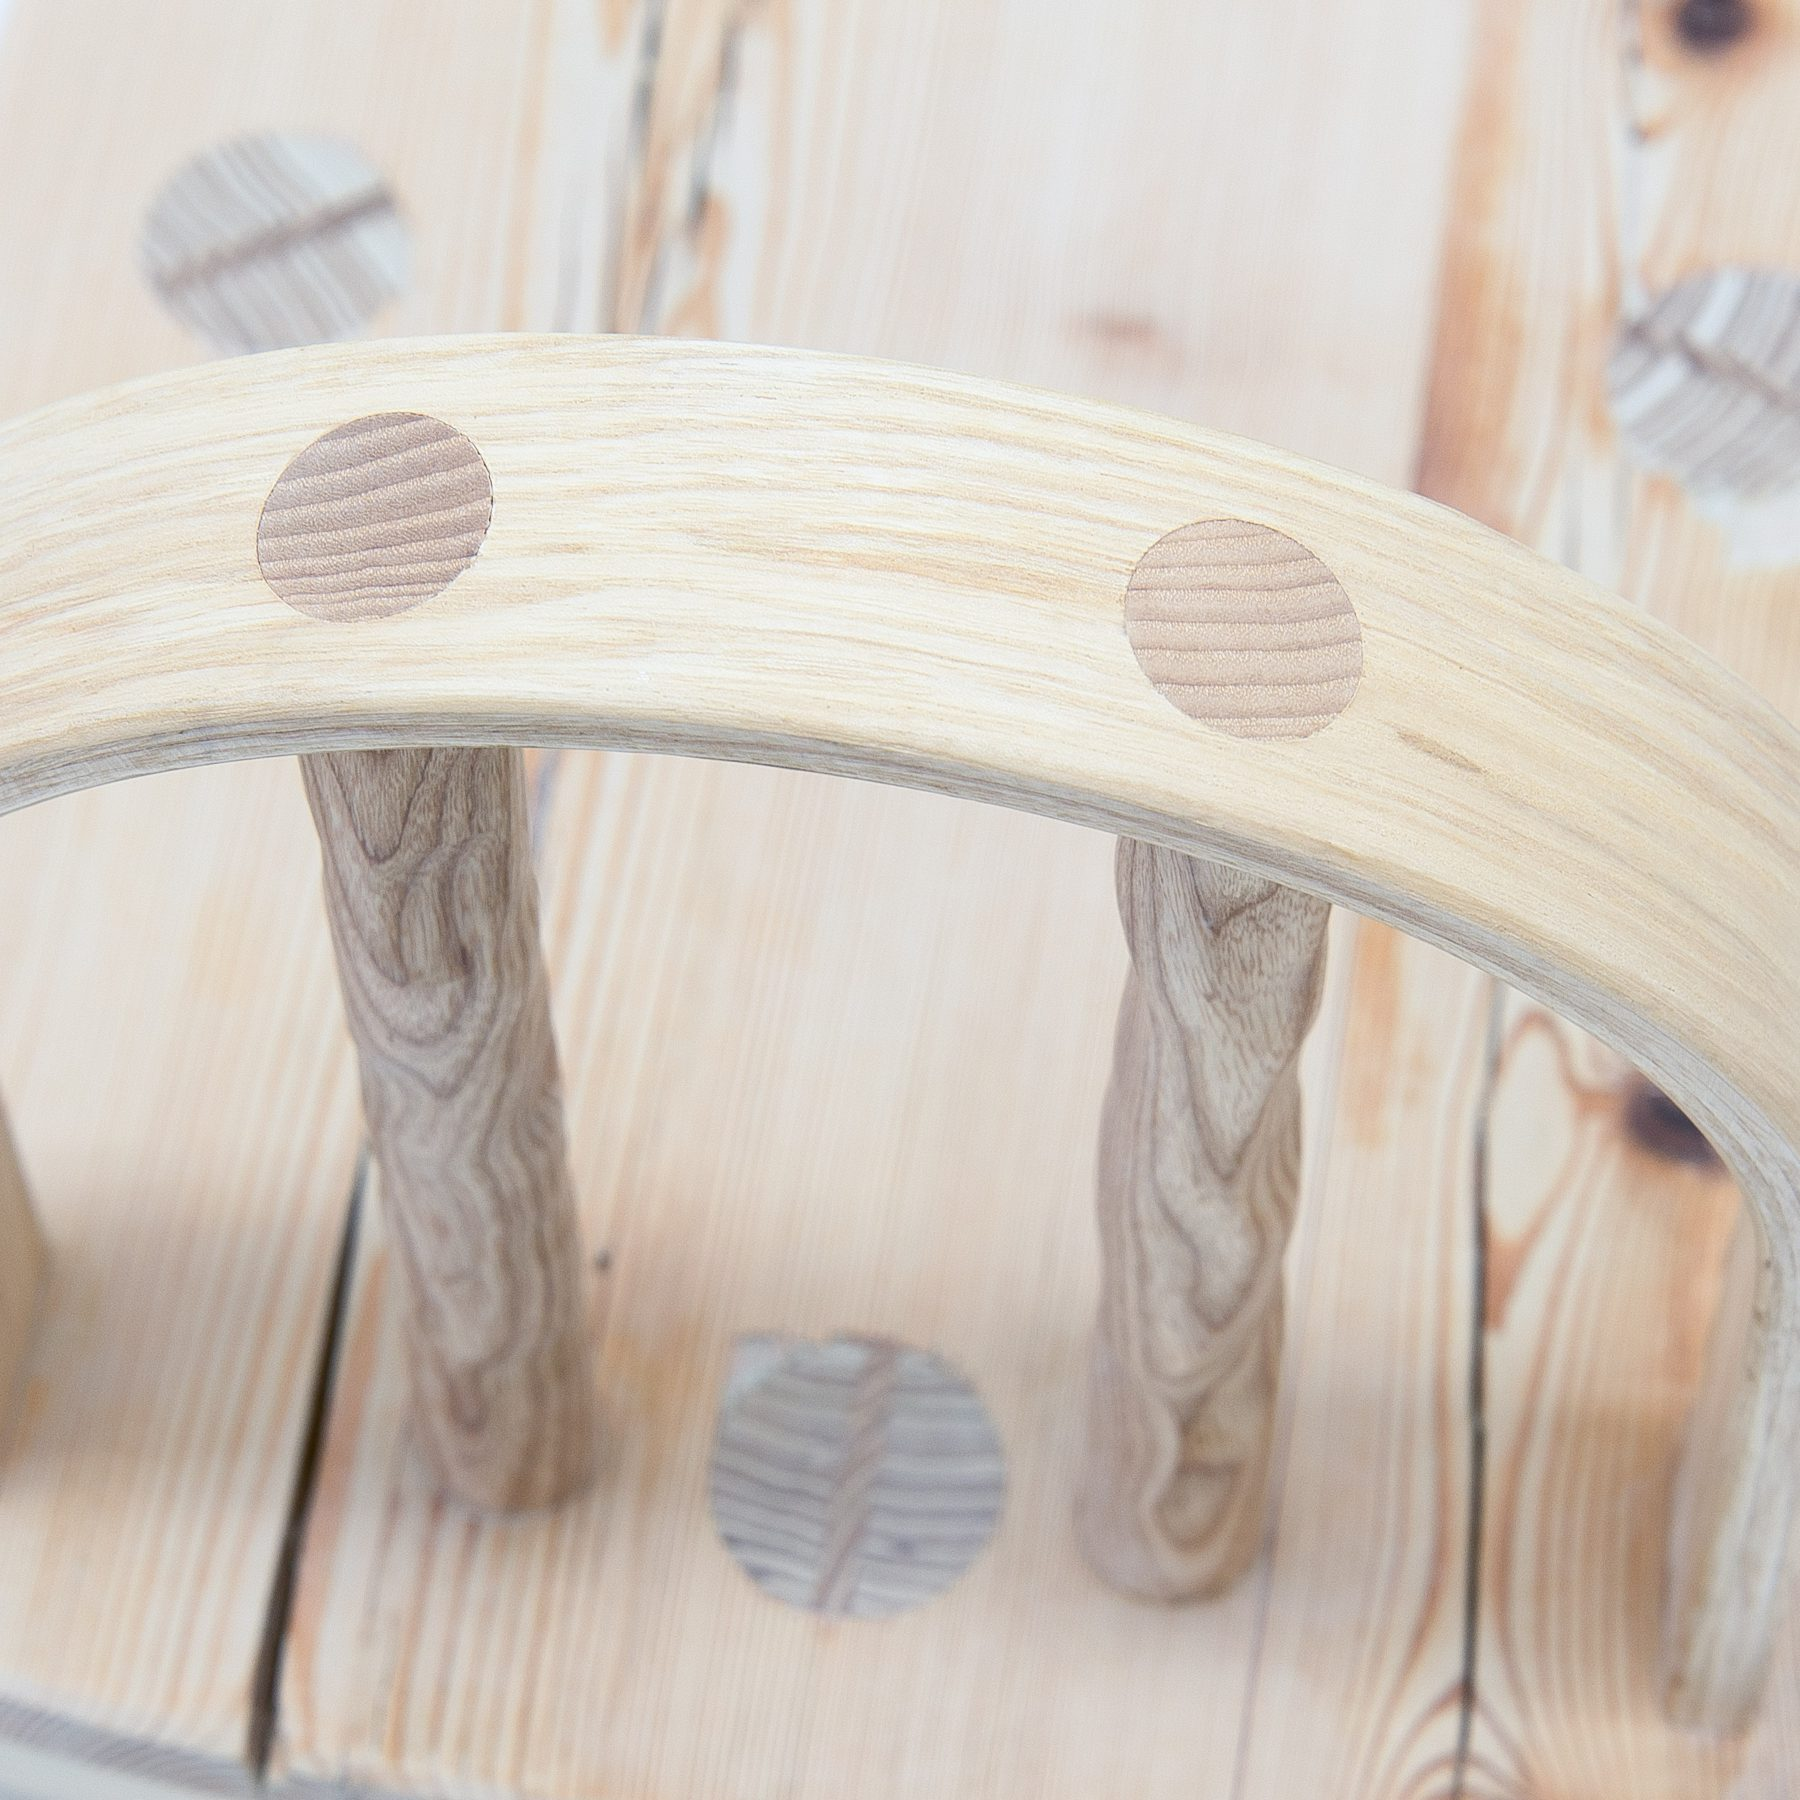 Jan Hendzel Studio lentini chair-6